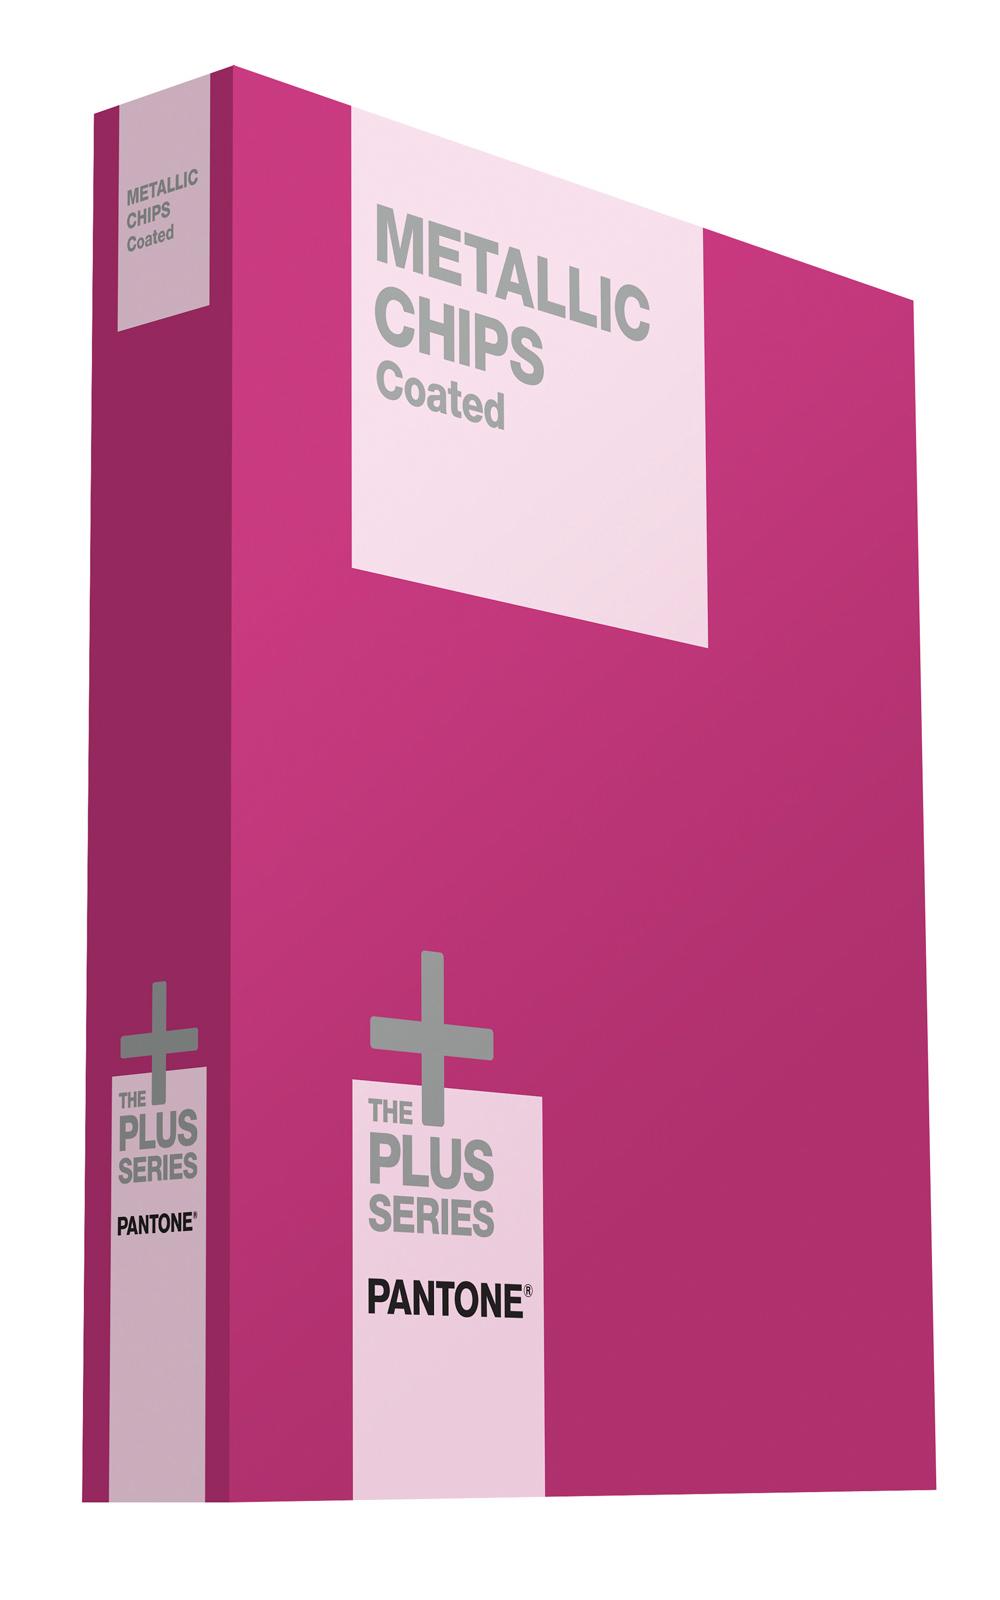 Buy Pantone Metallic and Pastel + Neon Chip Books & Guides!